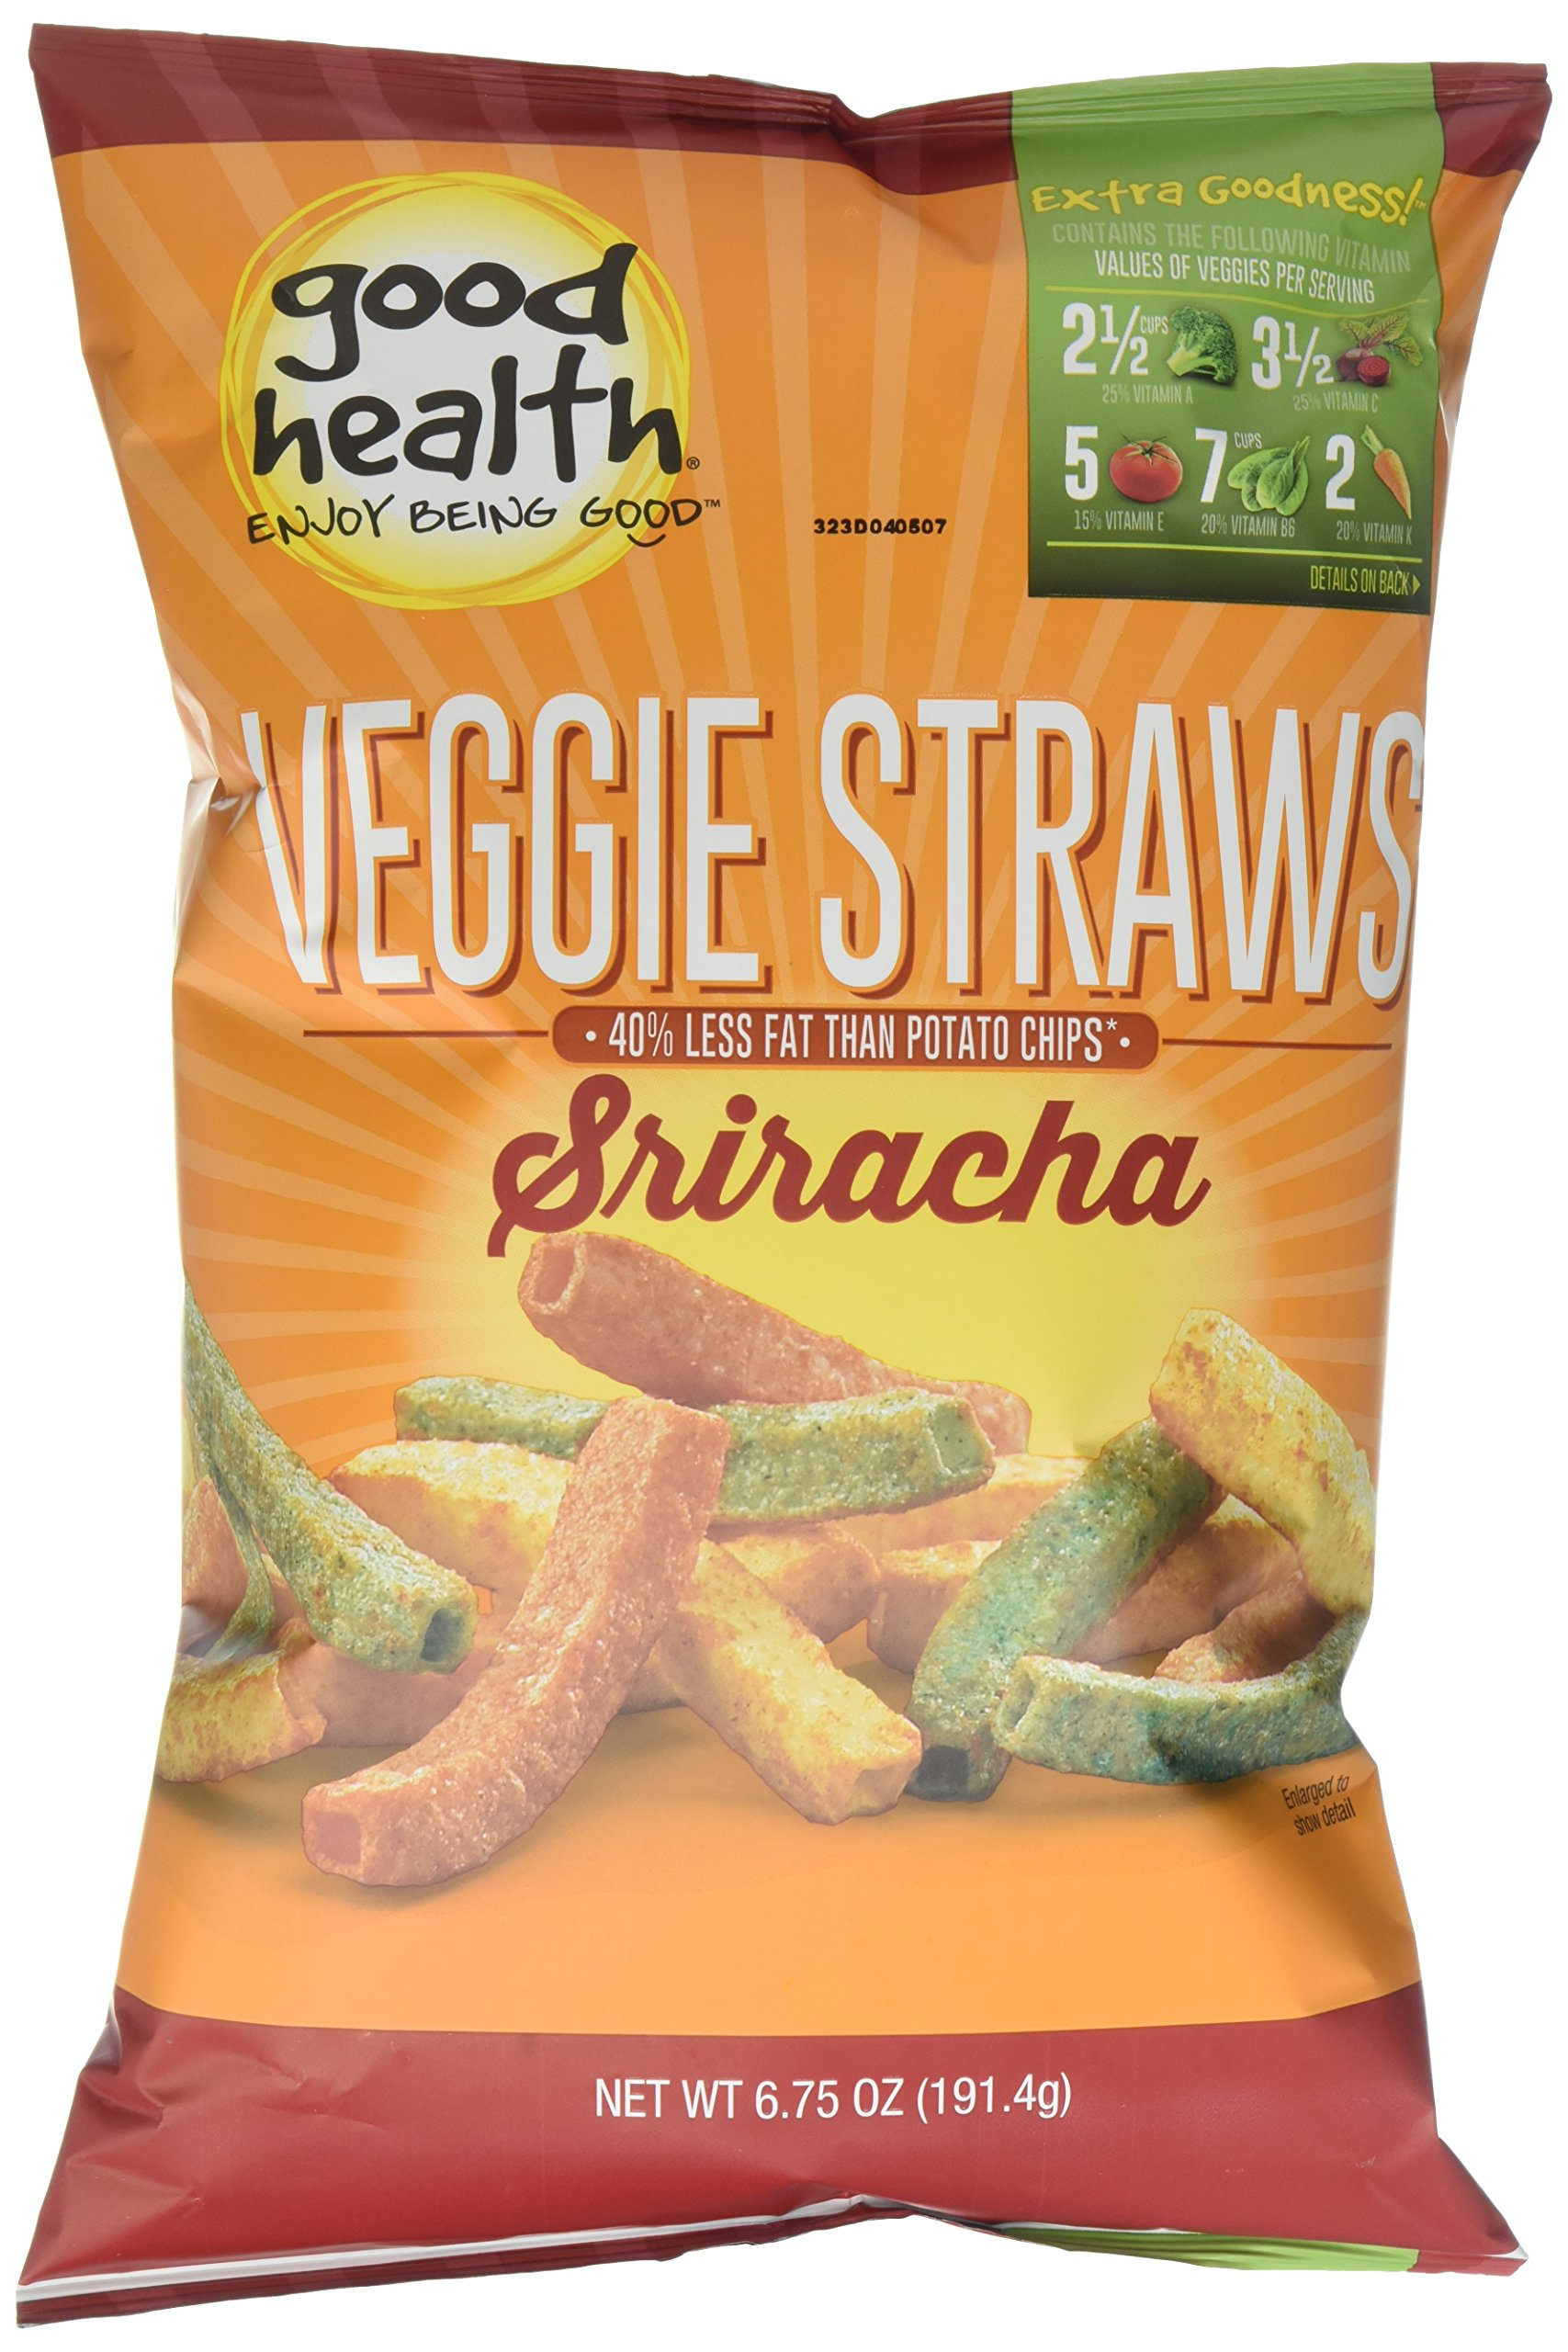 Good Health Veggie Straws, Sriracha, 10 Count (Pack of 10)